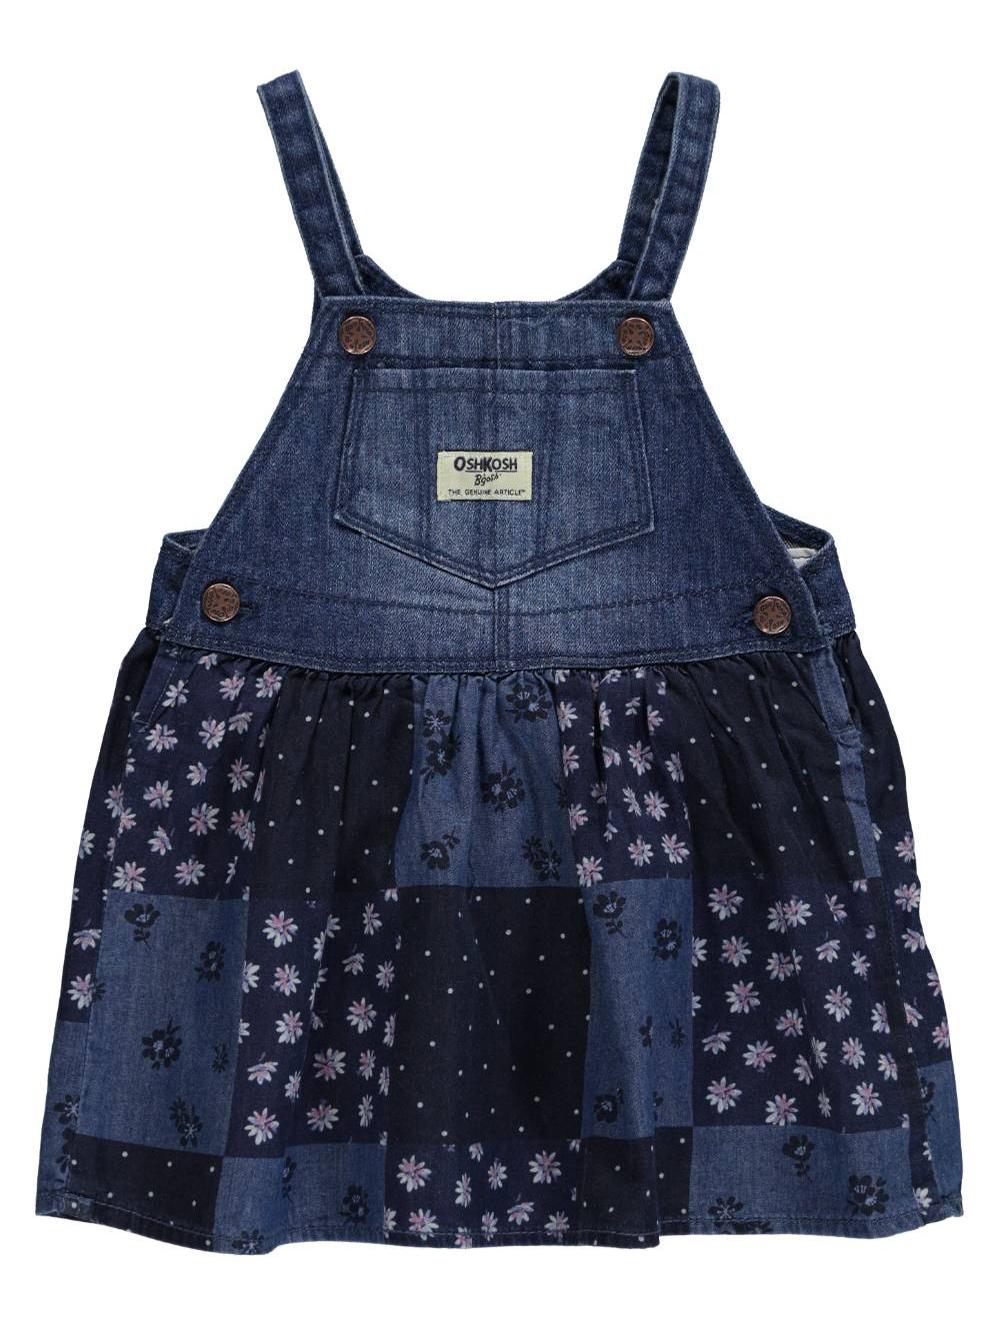 Image of OshKosh Baby Girls Patchwork Floral Overall Skirt  indigo blue 12 months